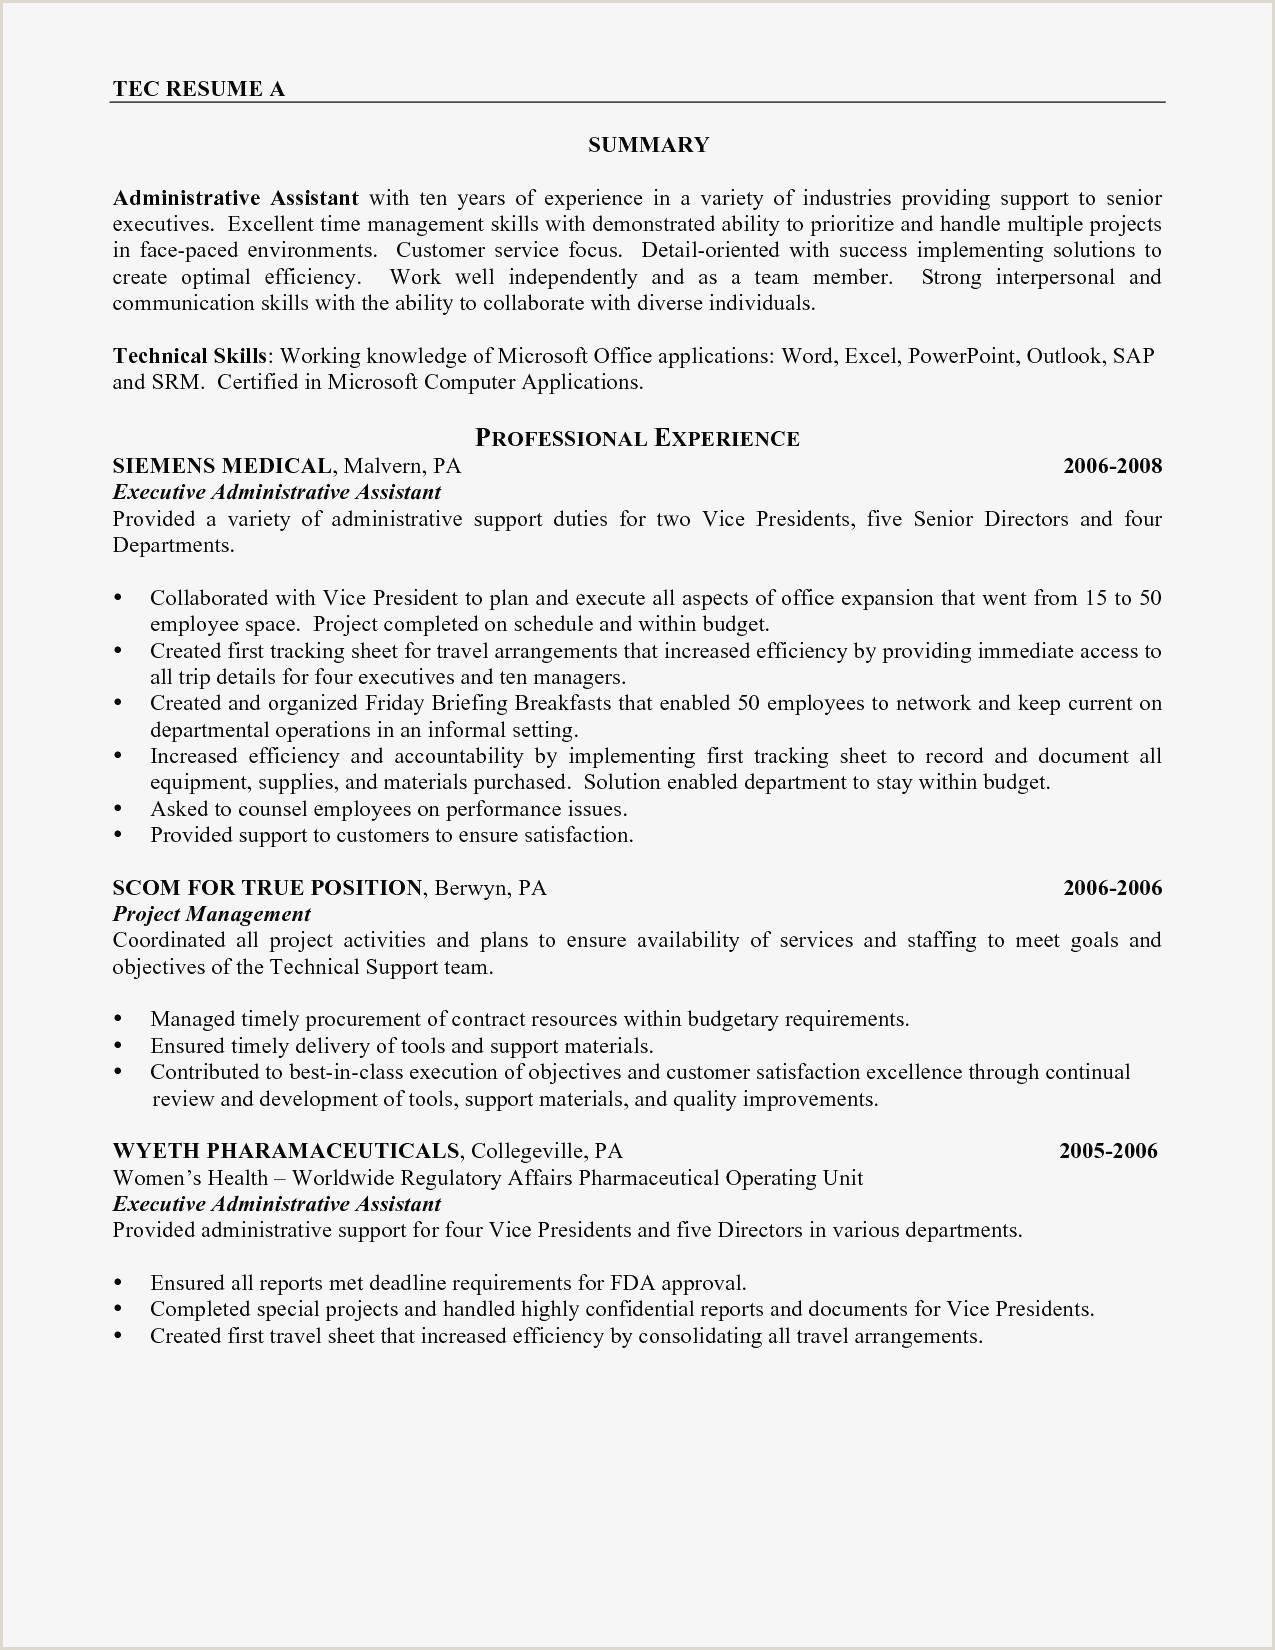 Administrative Assistant Resume Sample Pdf New Best Resume